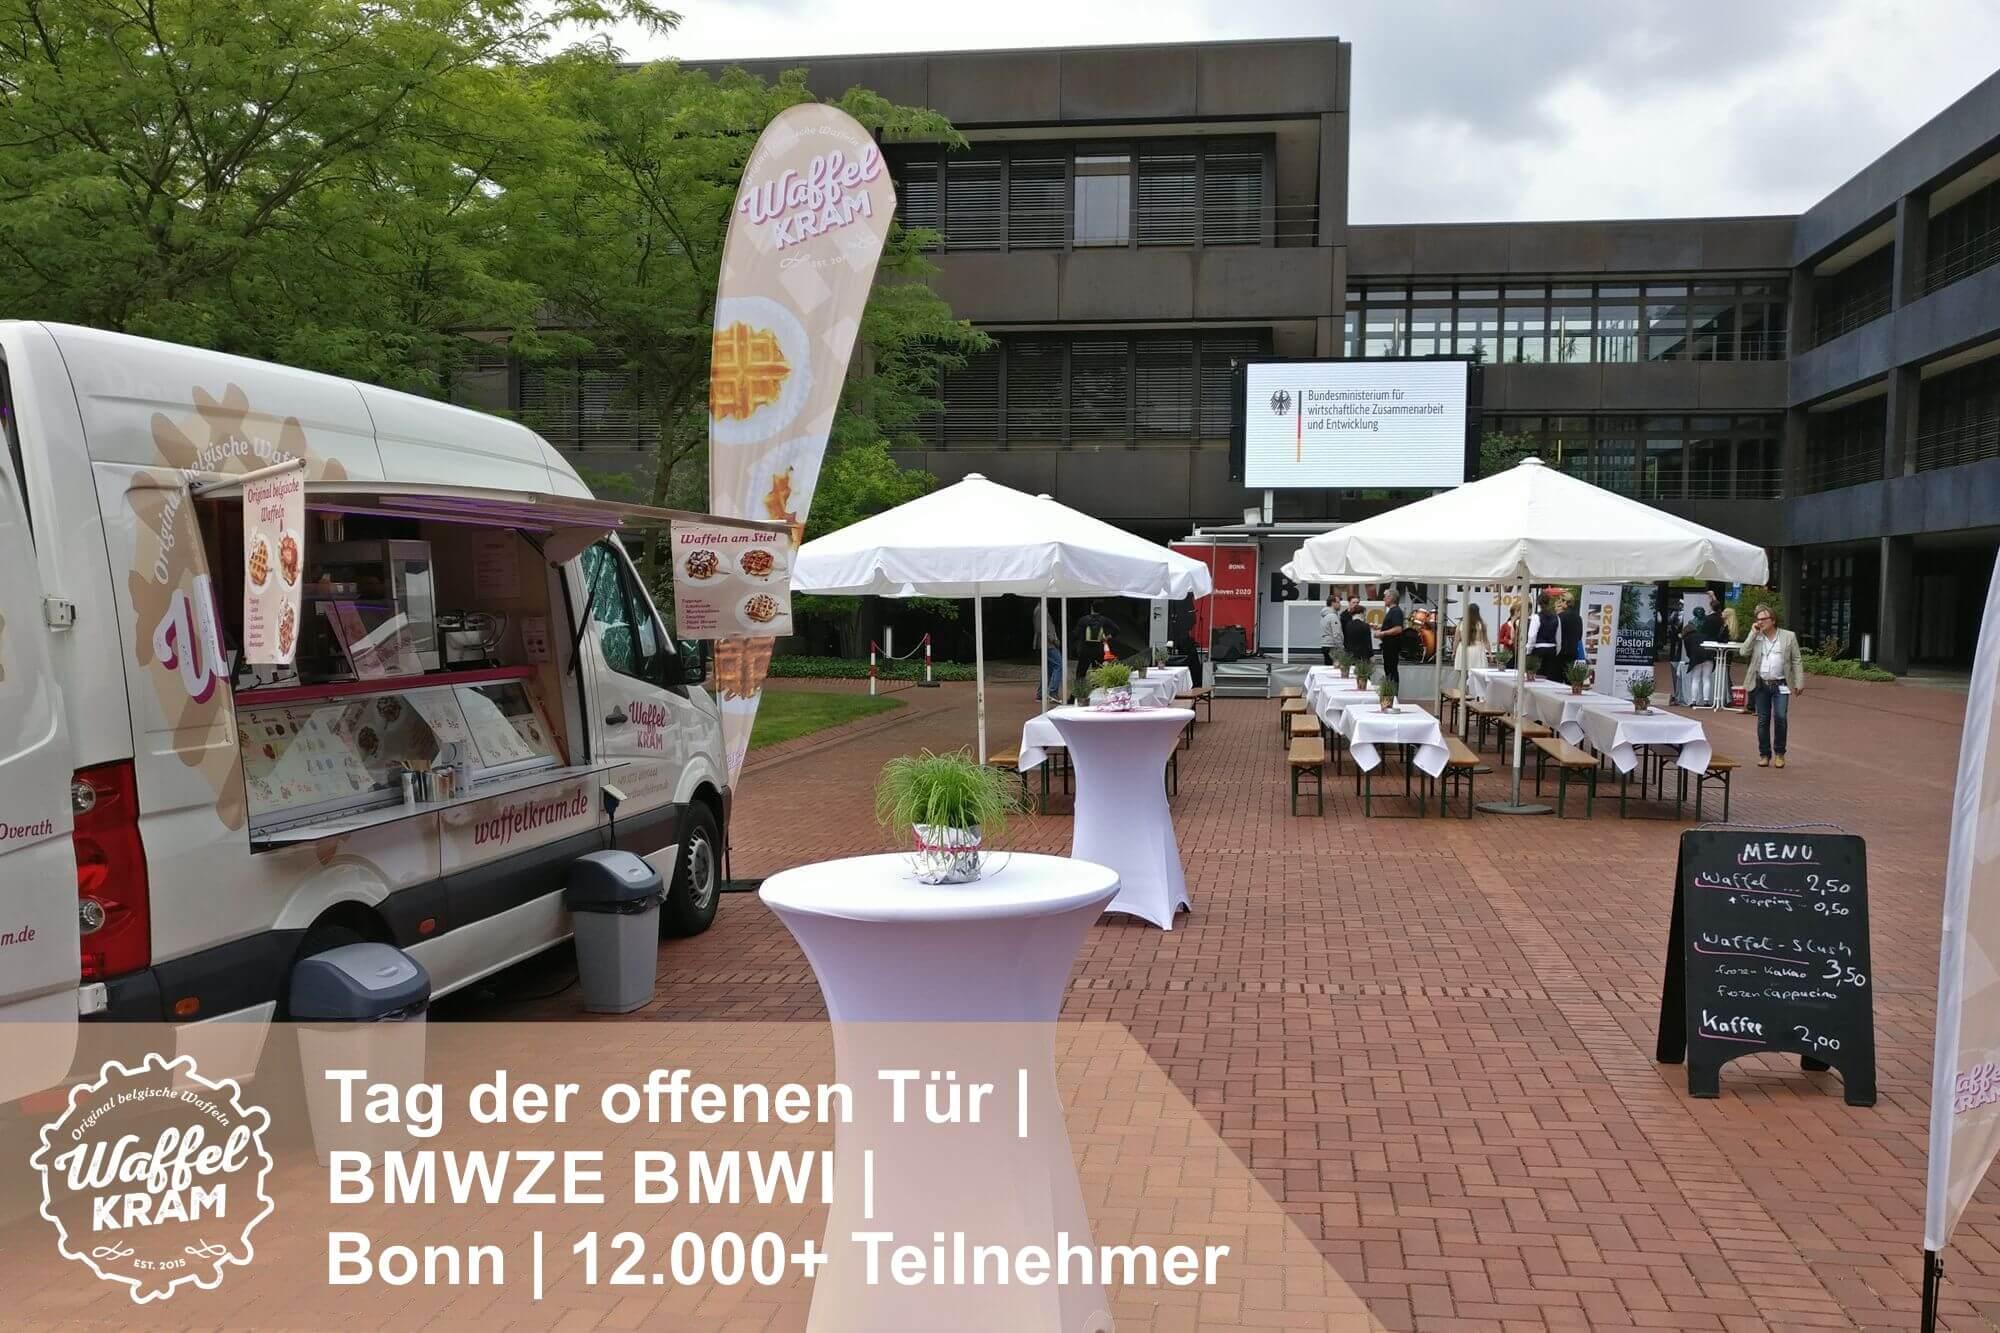 catering-tag-der-offenen-tuer-villa-hammerschmidt-bundesministerium-bmwze-bmwi-bonn-tx